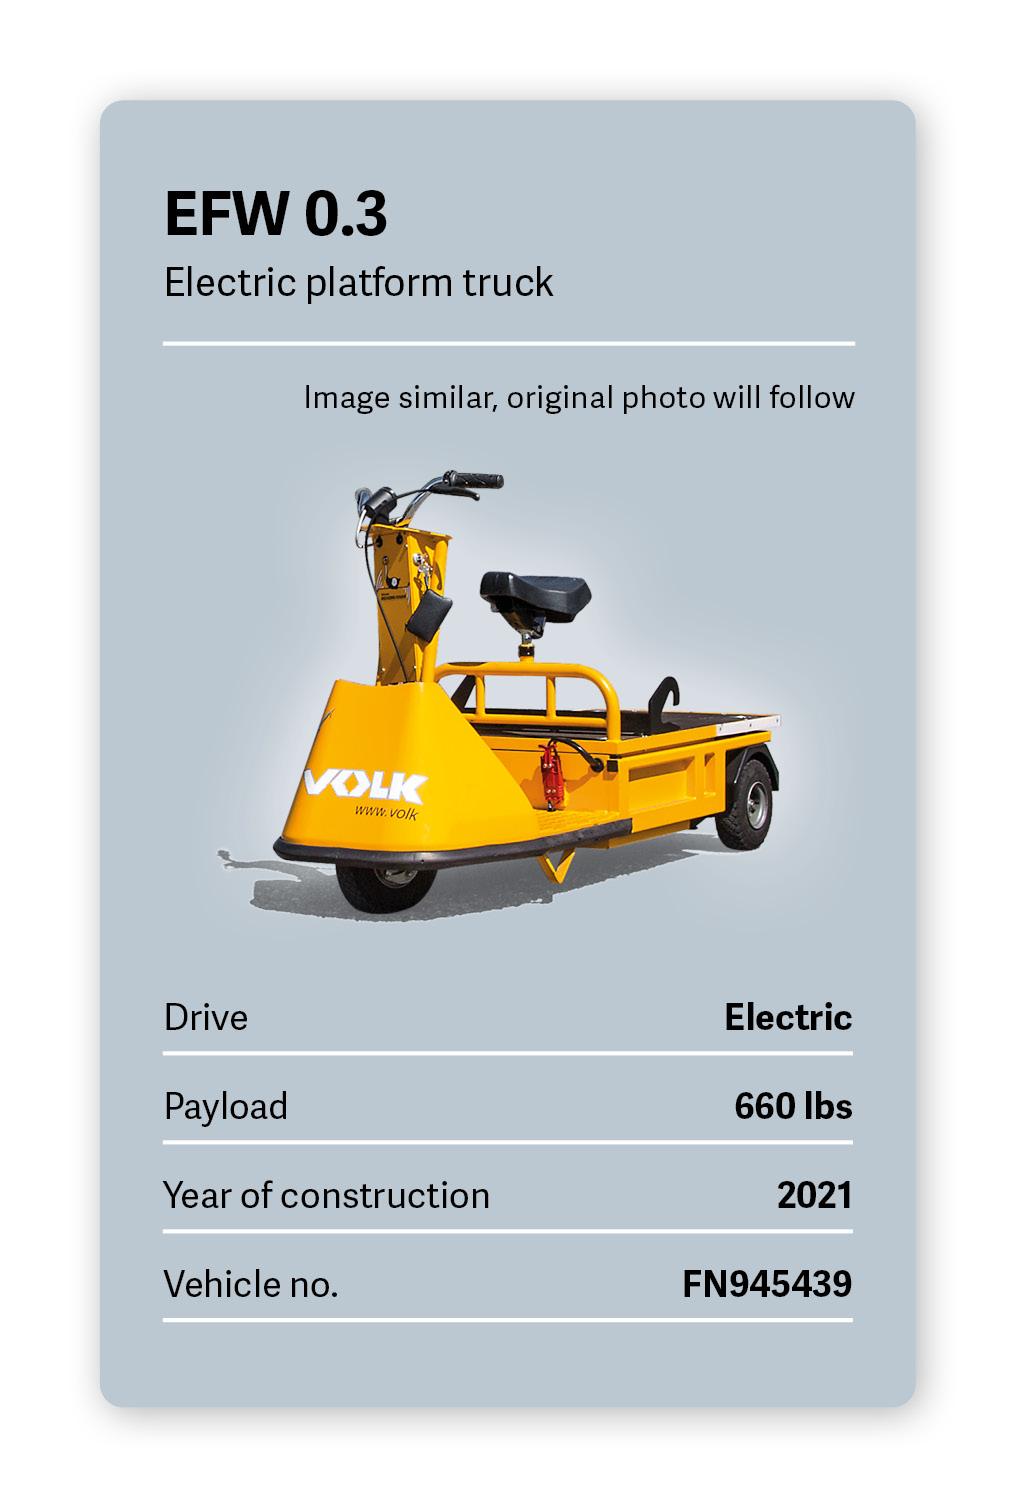 VOLK Electric Platform Tractor EFW 0.3 Used